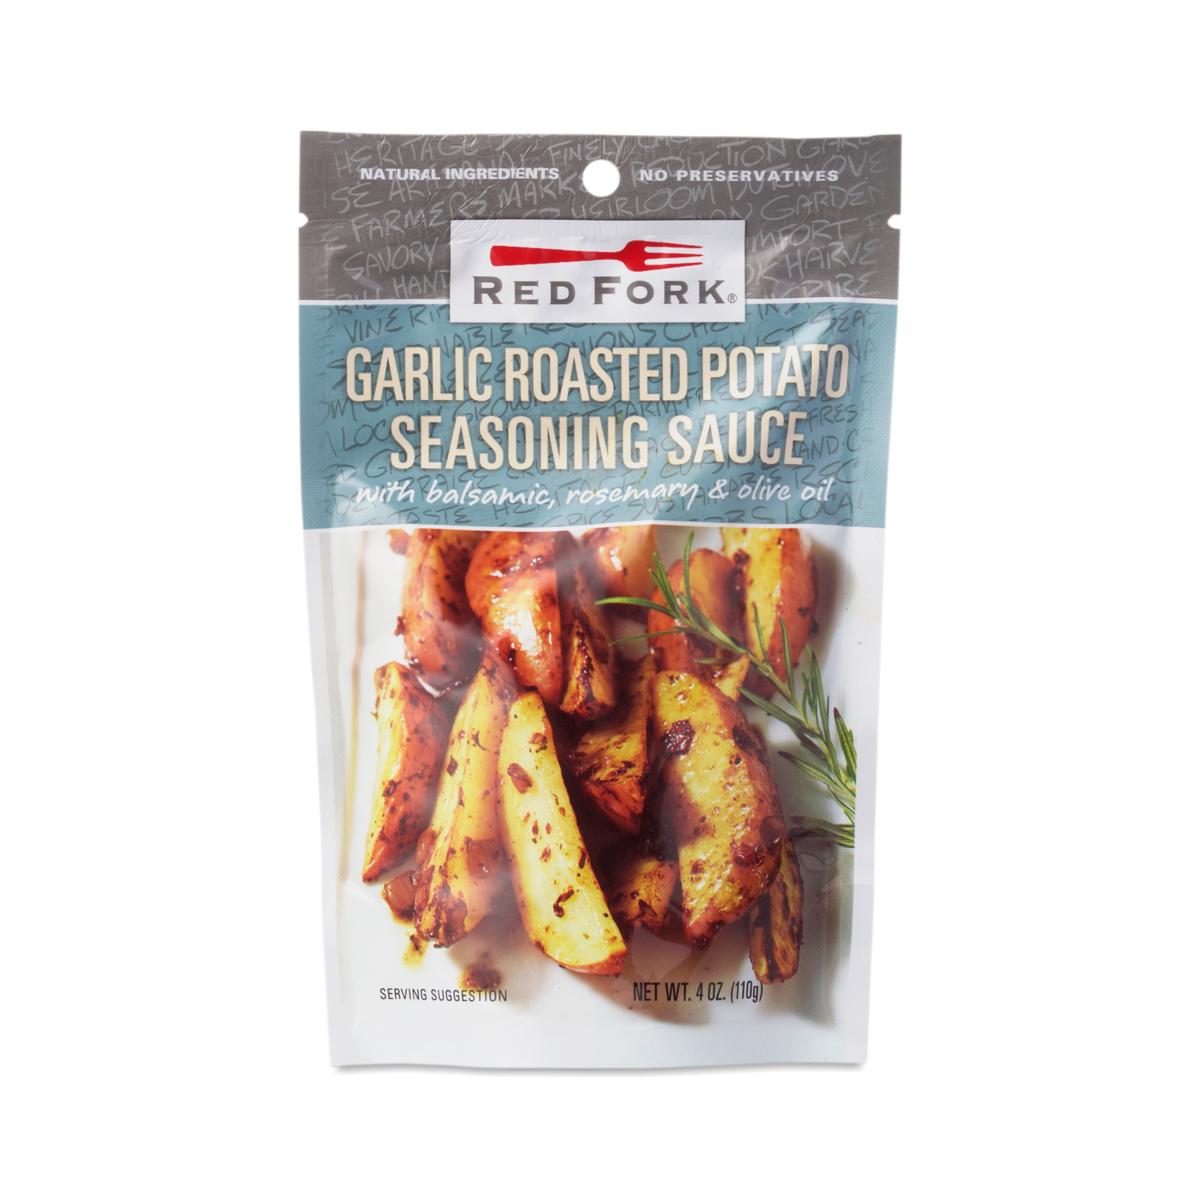 Nature's Best Garlic Roasted Potato Seasoning Sauce